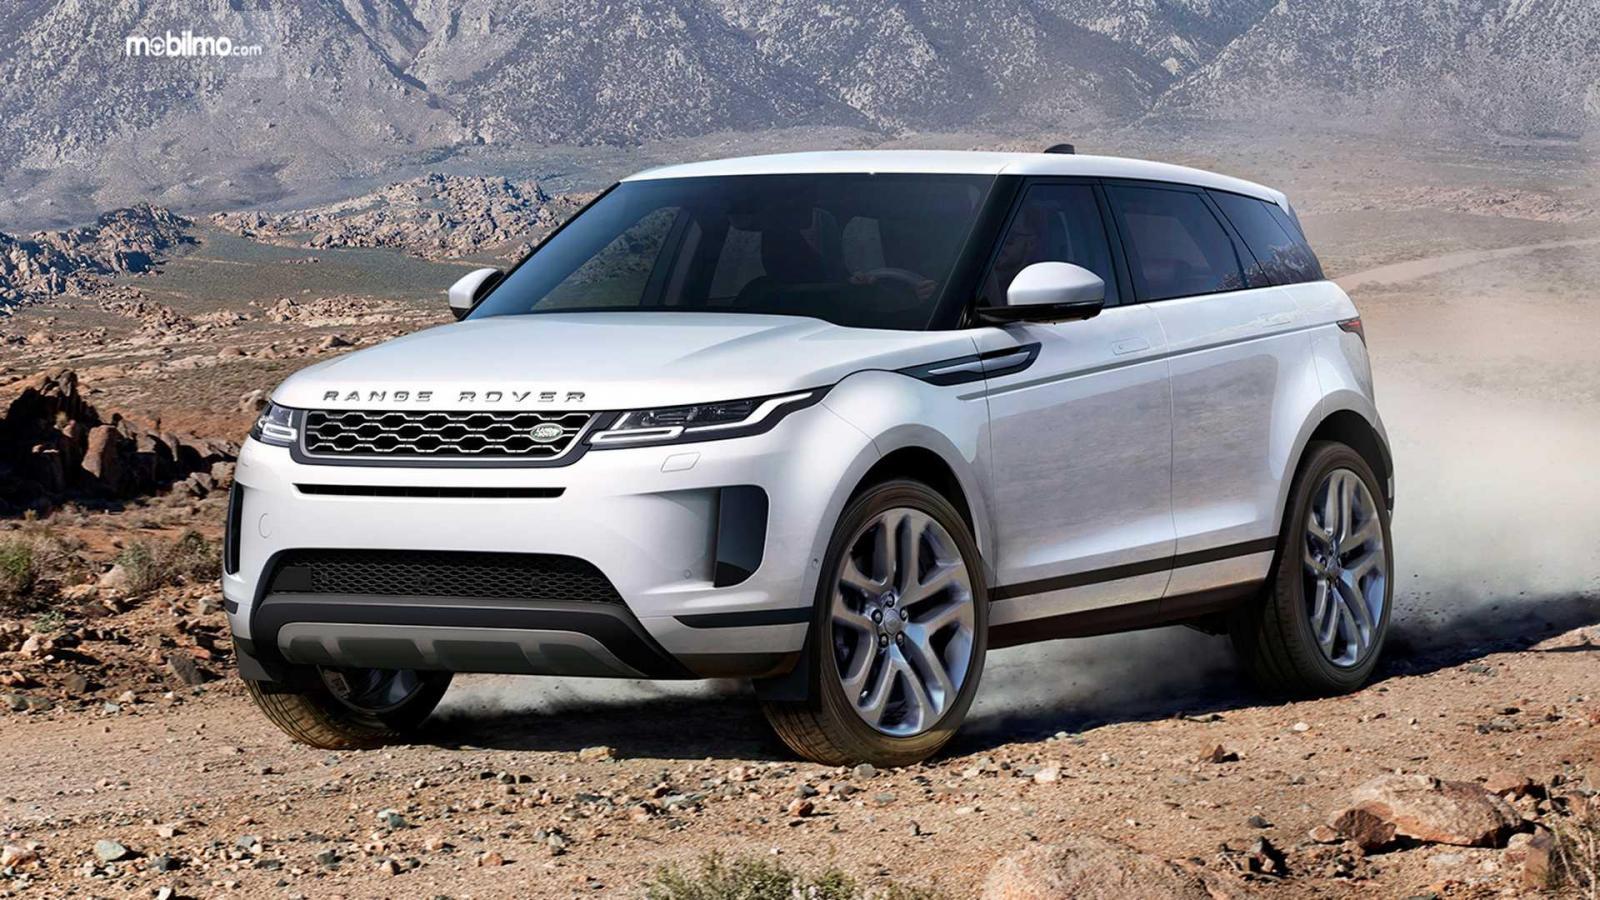 550+ Gambar Mobil Land Rover Gratis